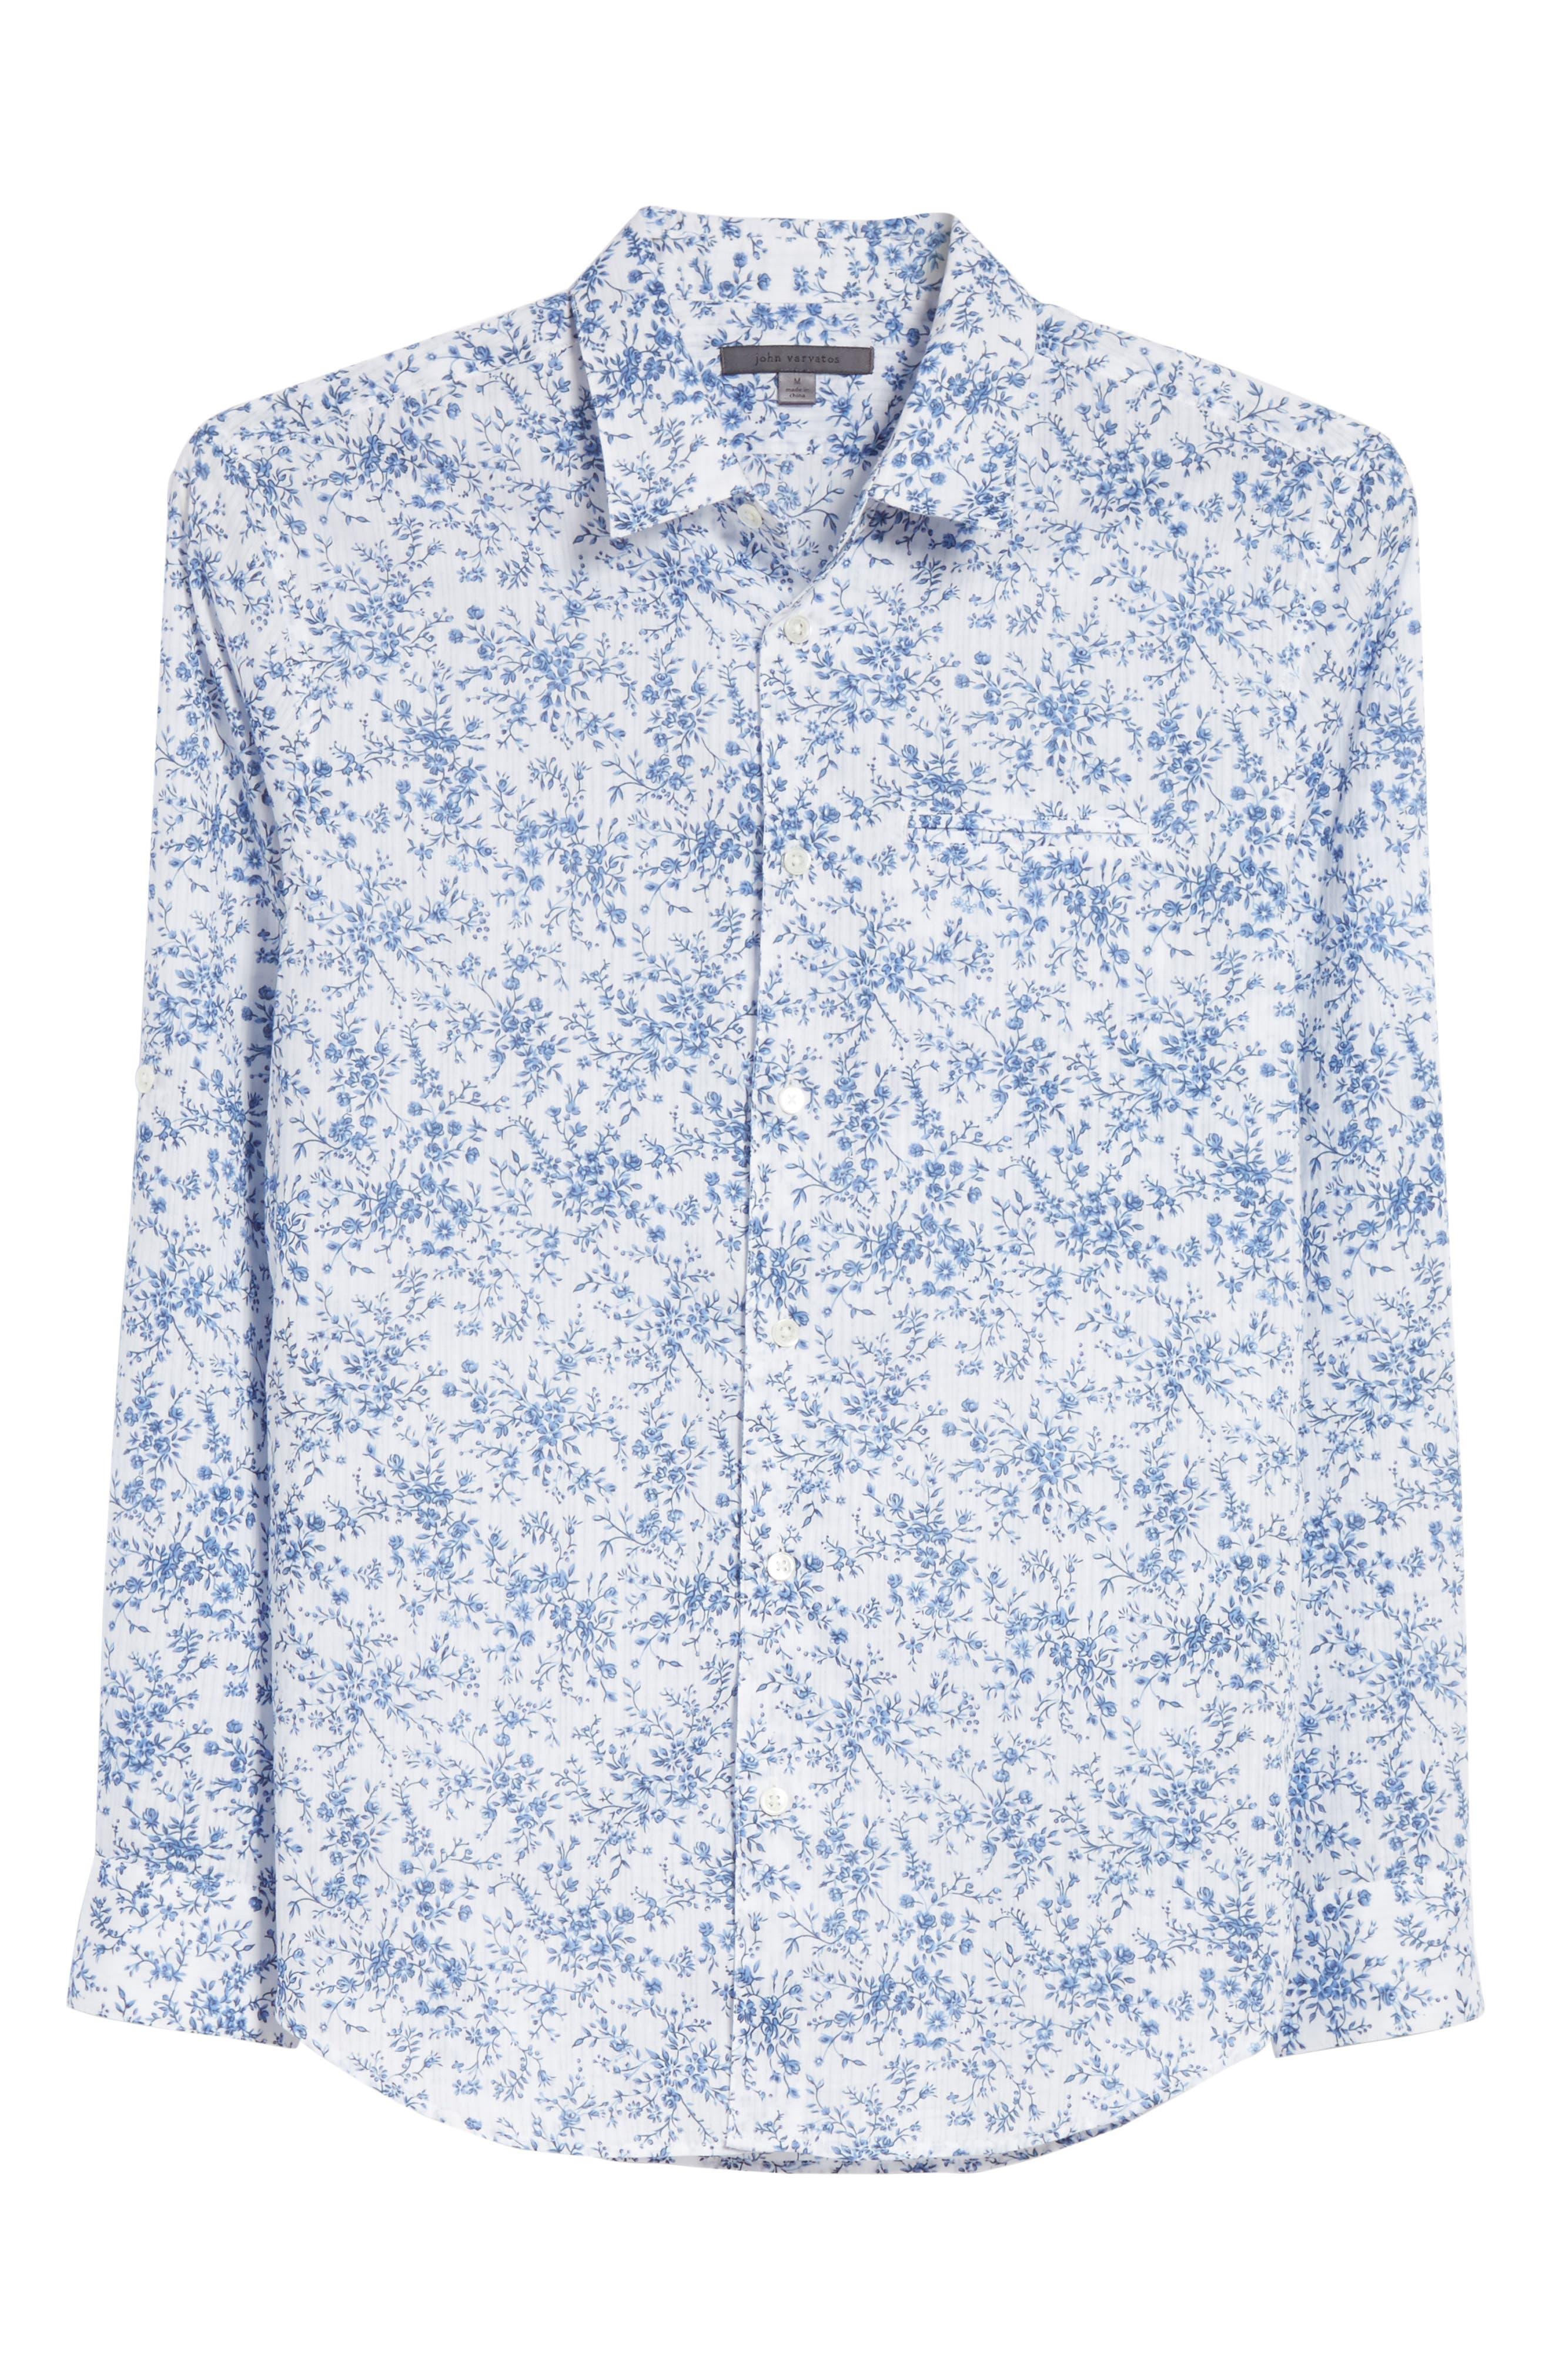 John Varvatos Slim Fit Floral Print Shirt,                             Alternate thumbnail 6, color,                             448